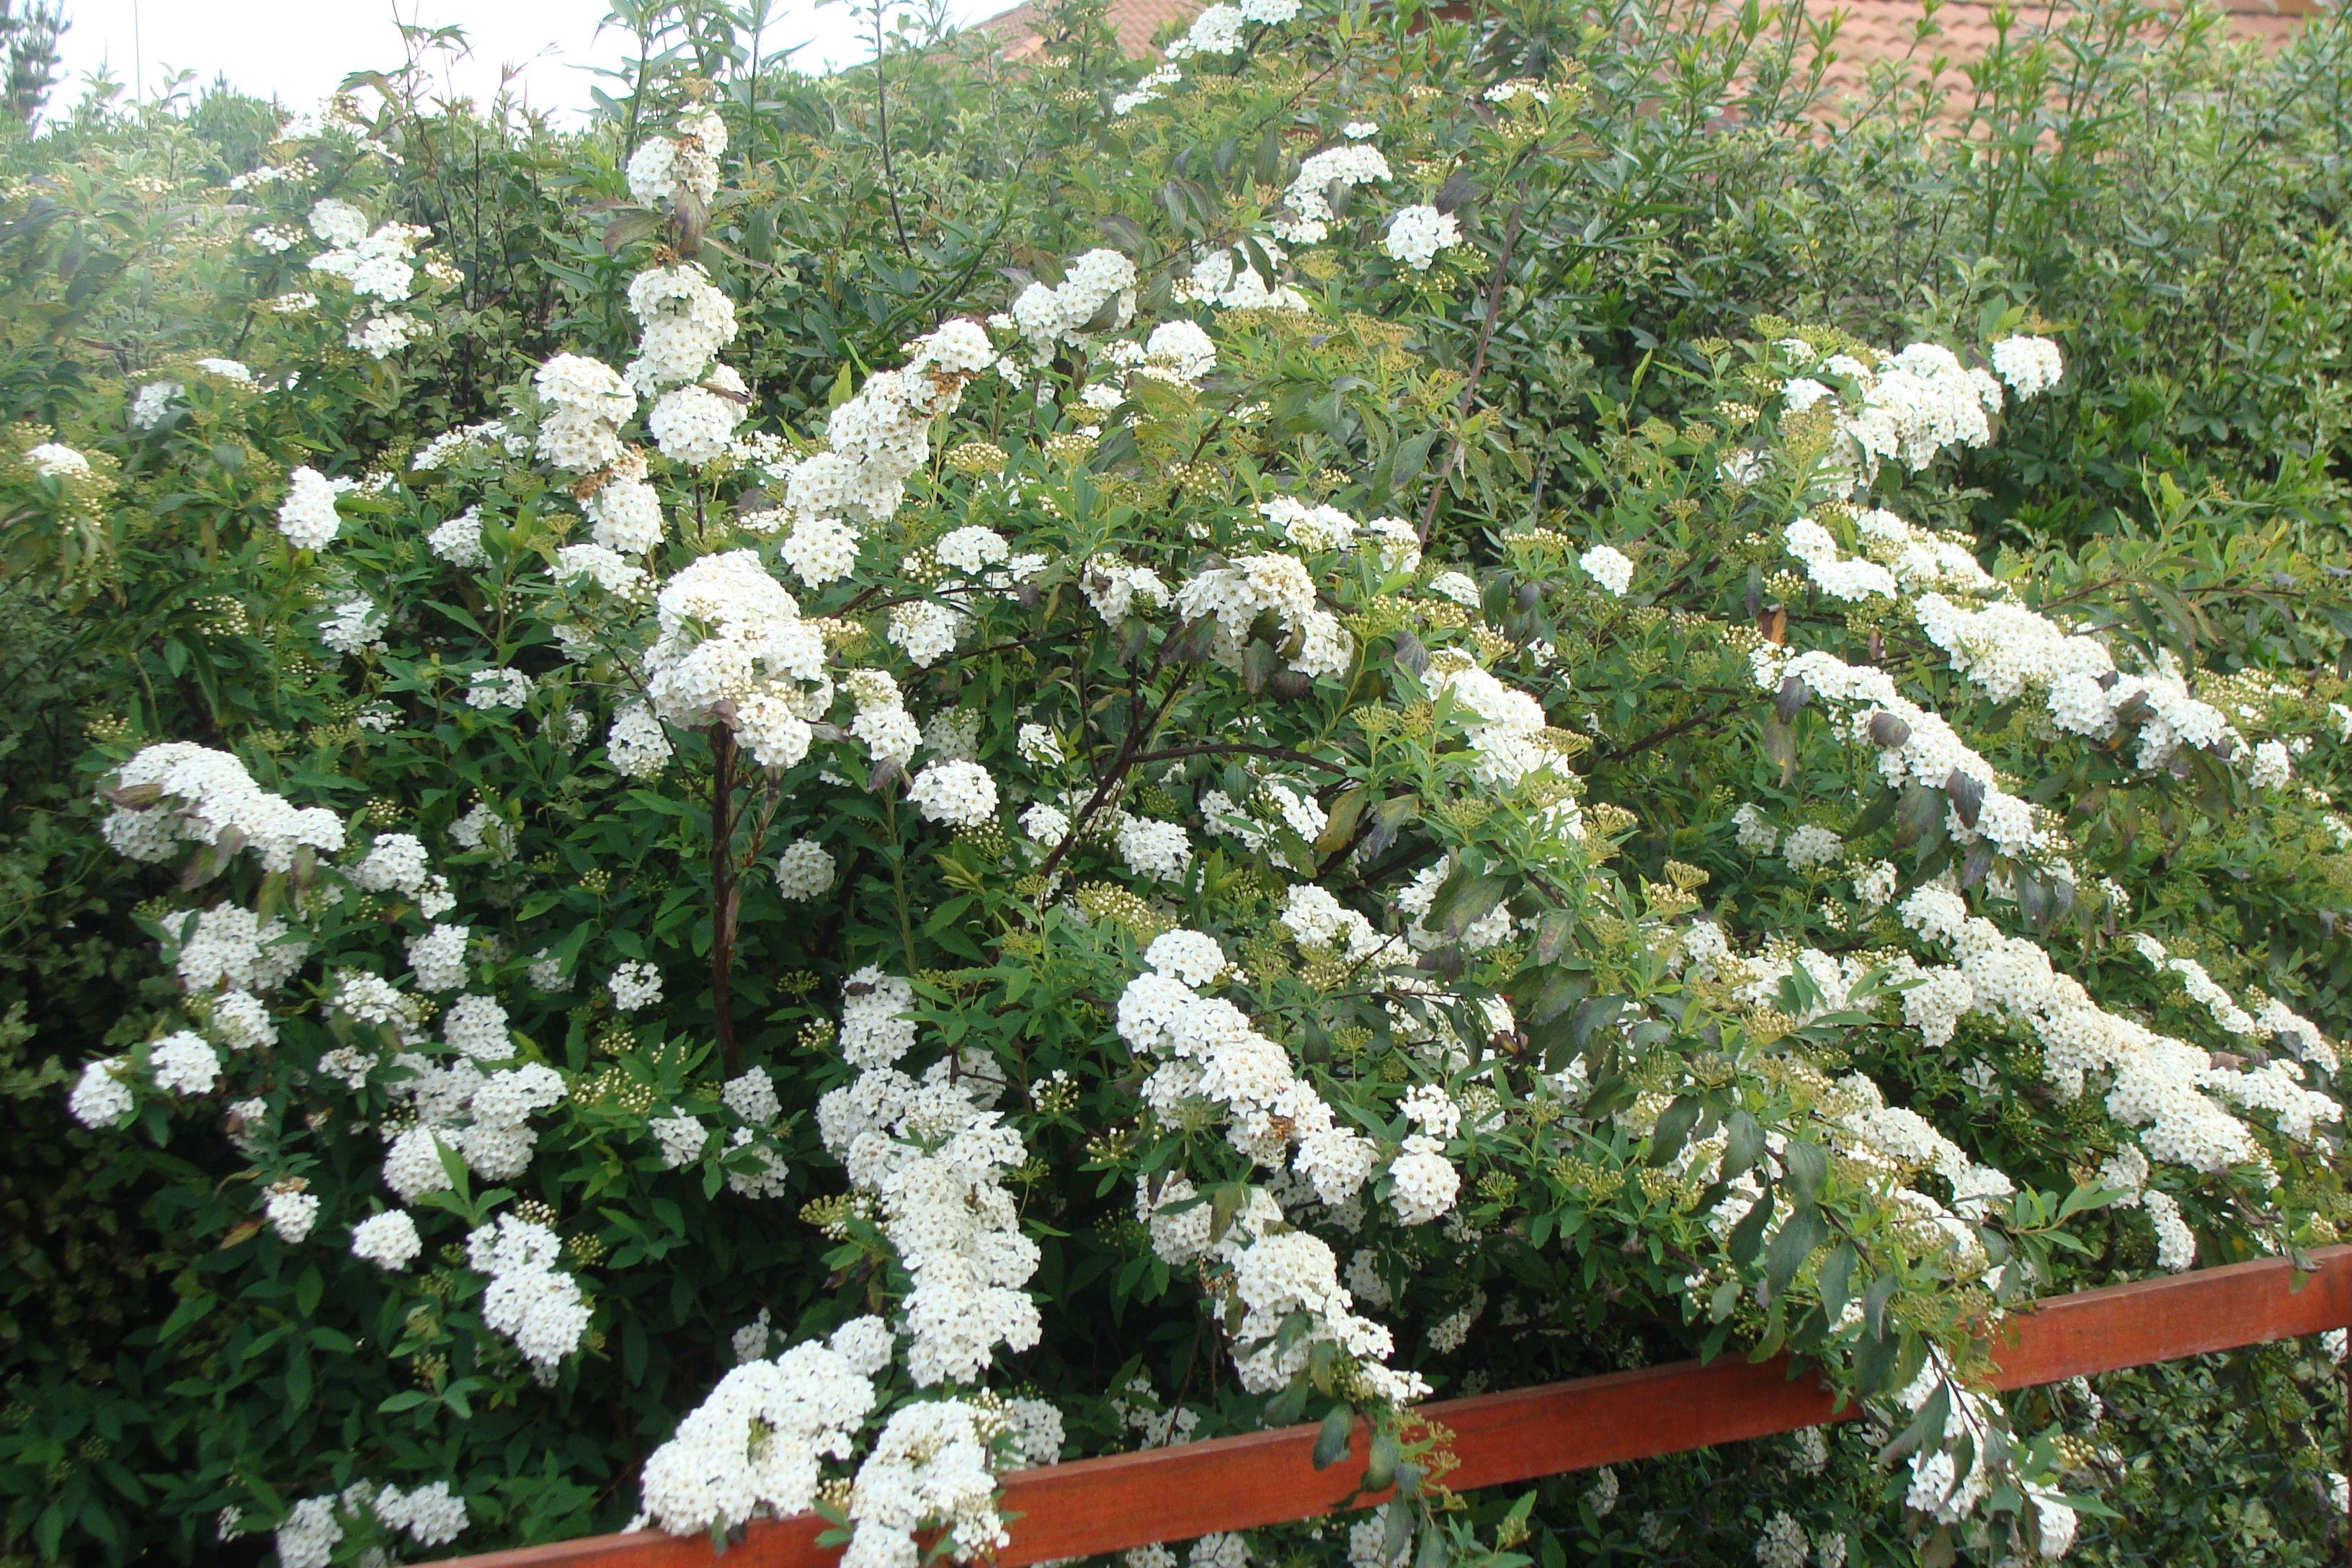 Spiraea Cantoniensis Also Known As Reeves Spirea Or Bridal Wreath